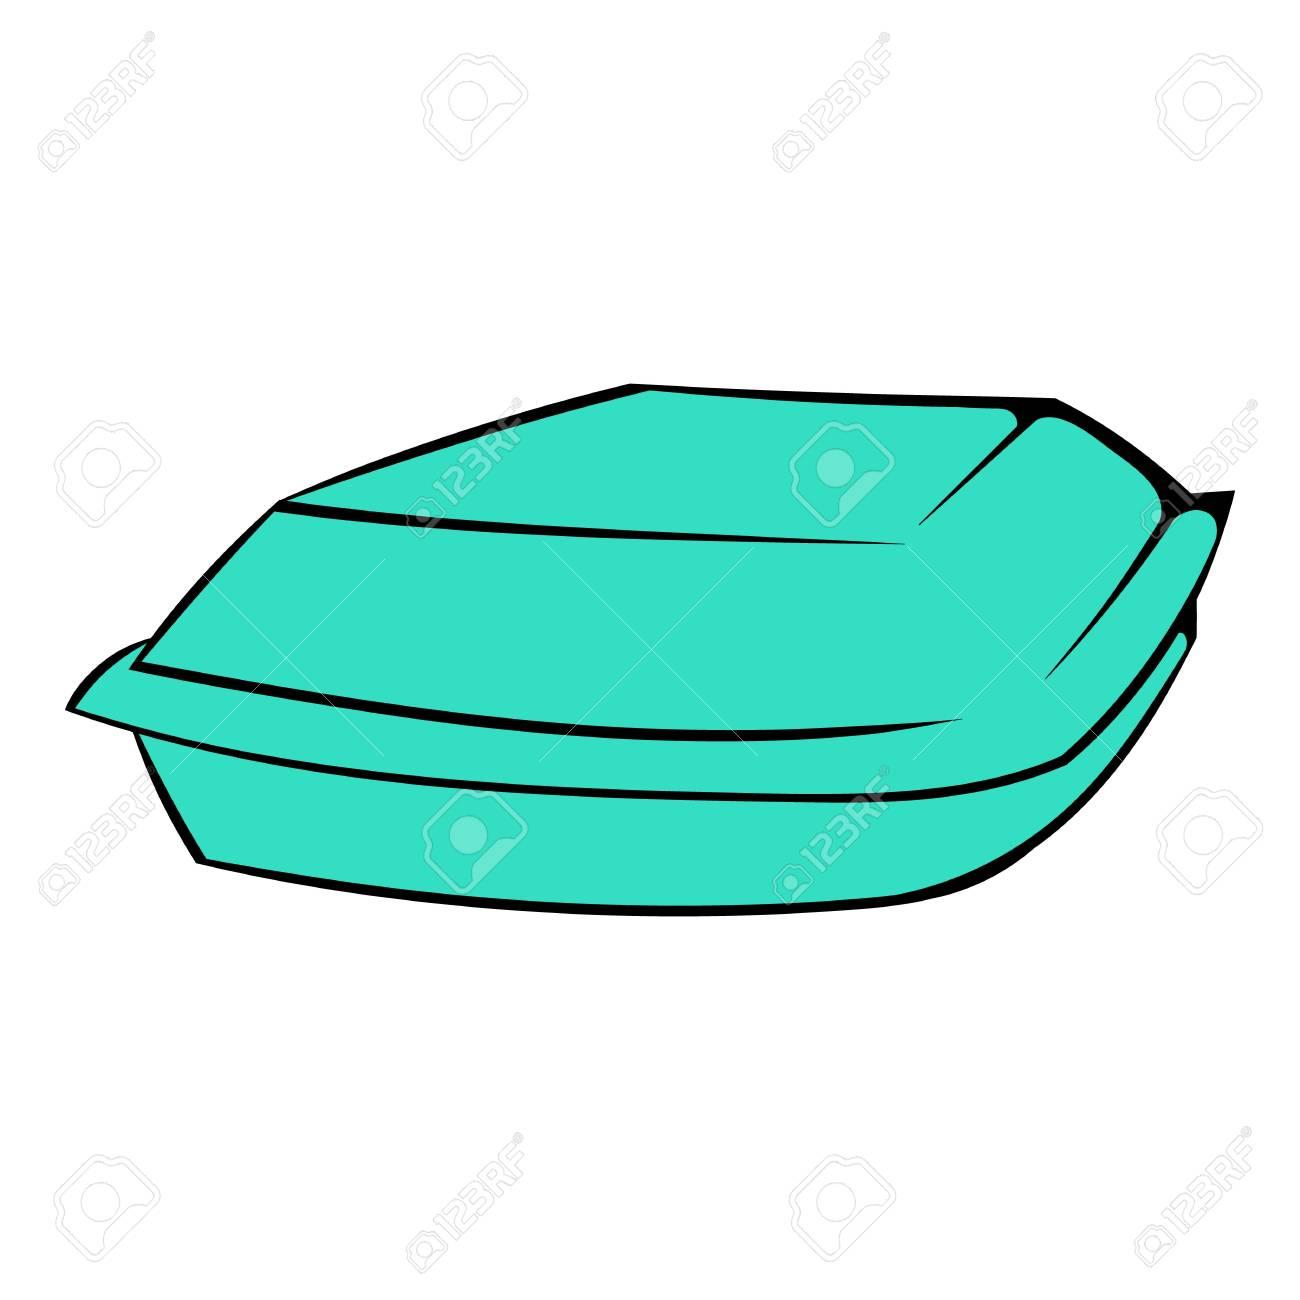 Food box icon, icon cartoon.